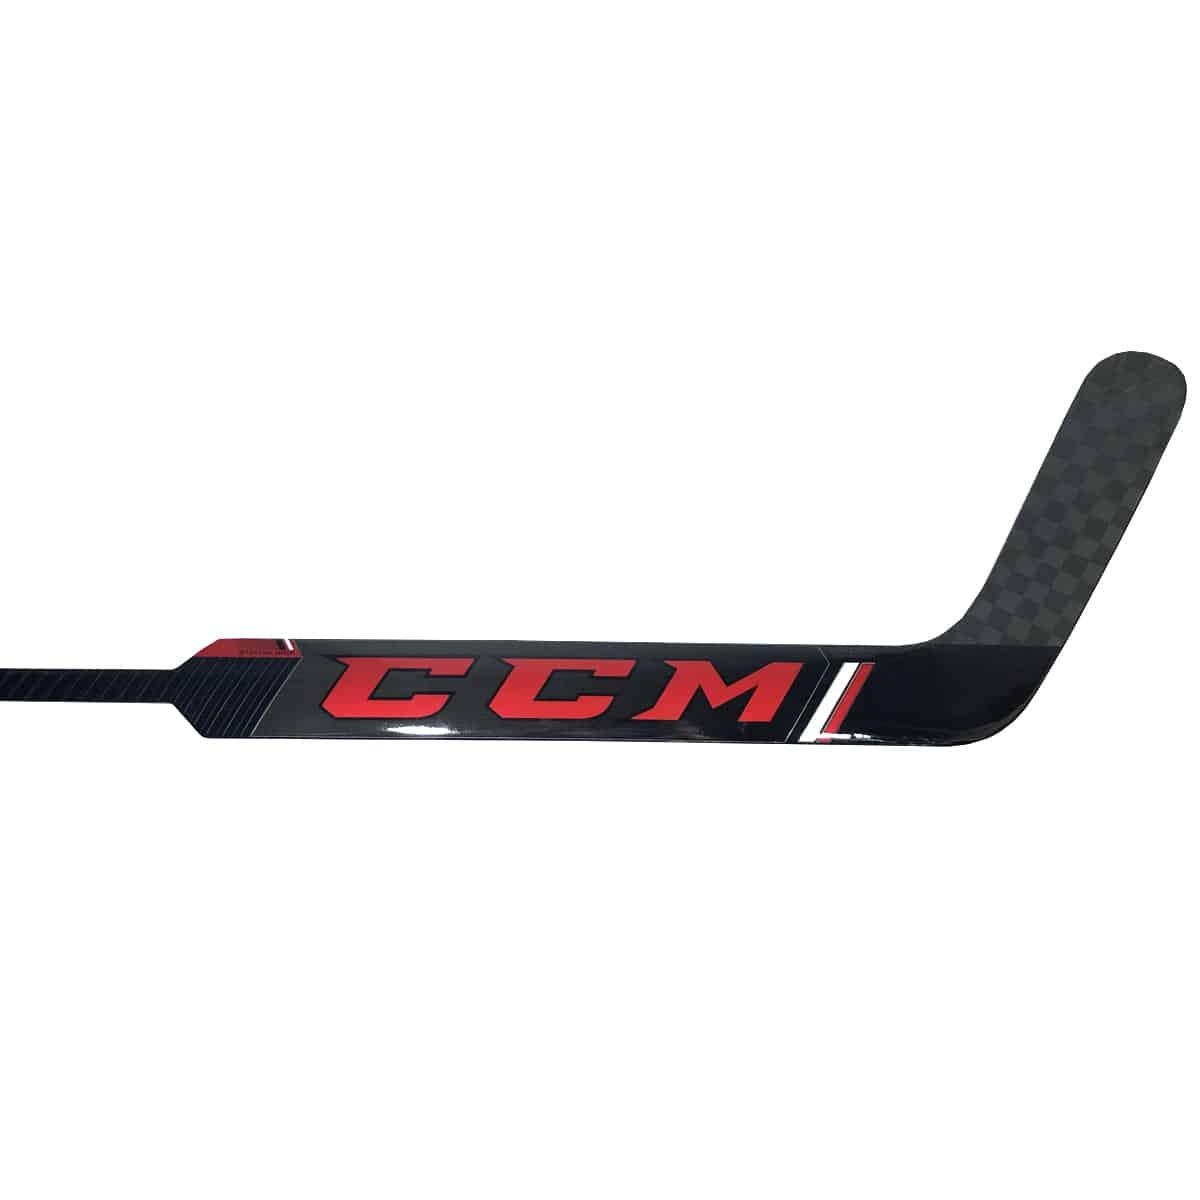 Goalies Plus Best Price Ccm Extreme Flex 4 Senior Goalie Stick